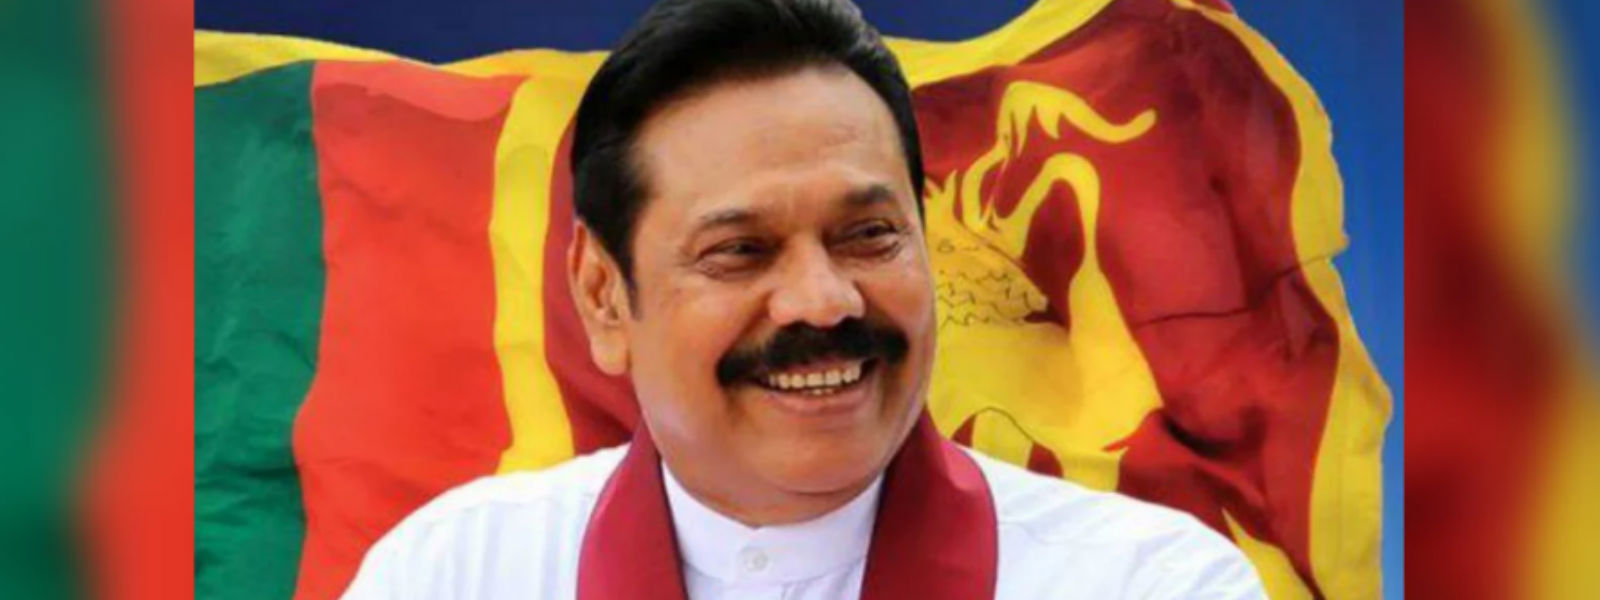 Pay salaries of public officers on Monday- Prime Minister Mahinda Rajapaksa